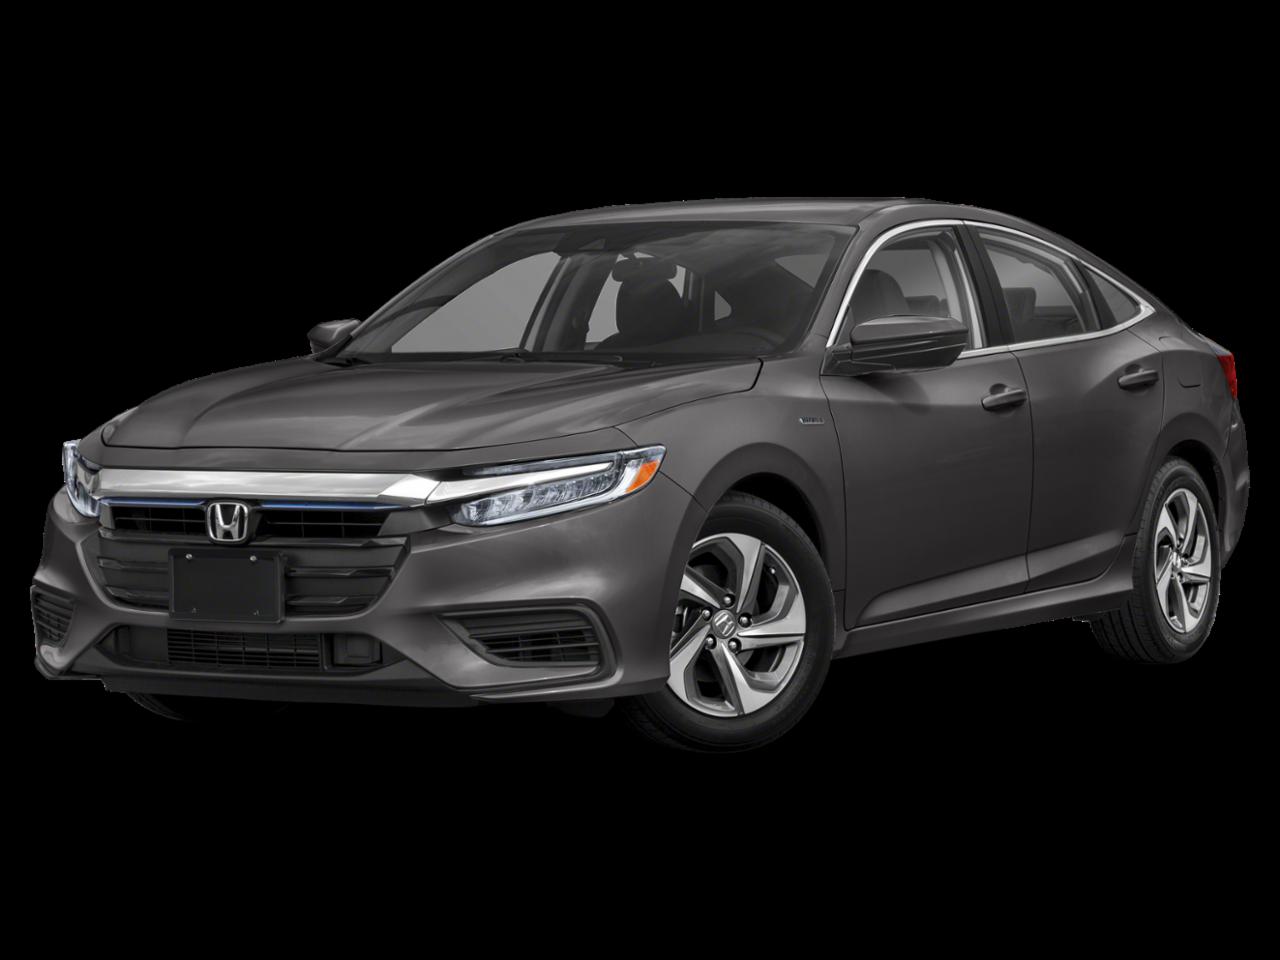 Honda 2019 Insight LX